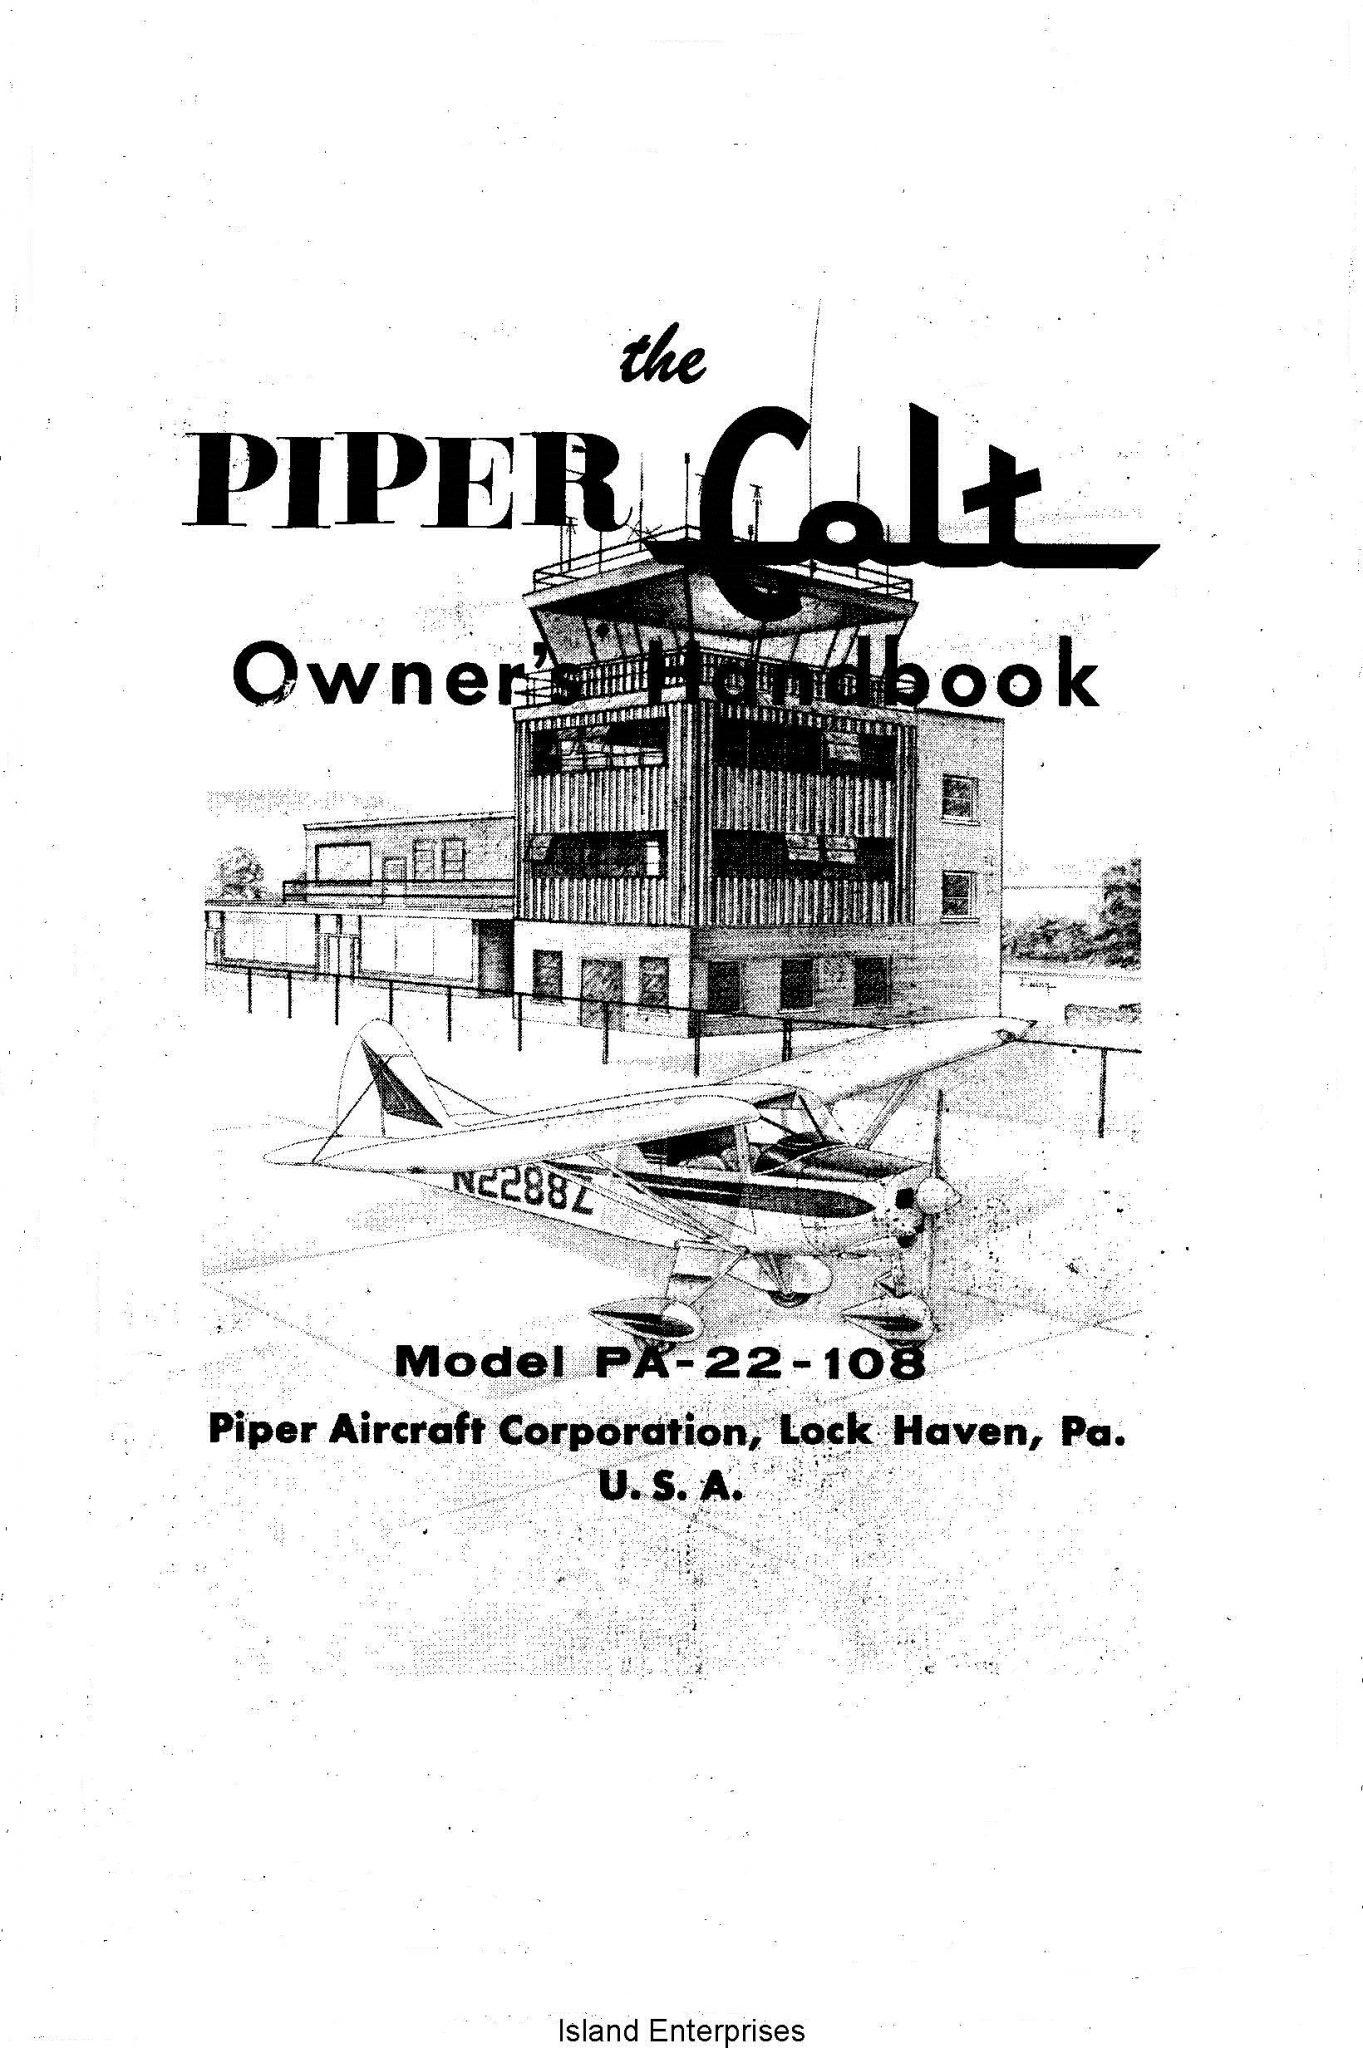 Piper Colt PA-22-108 Owner's Handbook 753-594